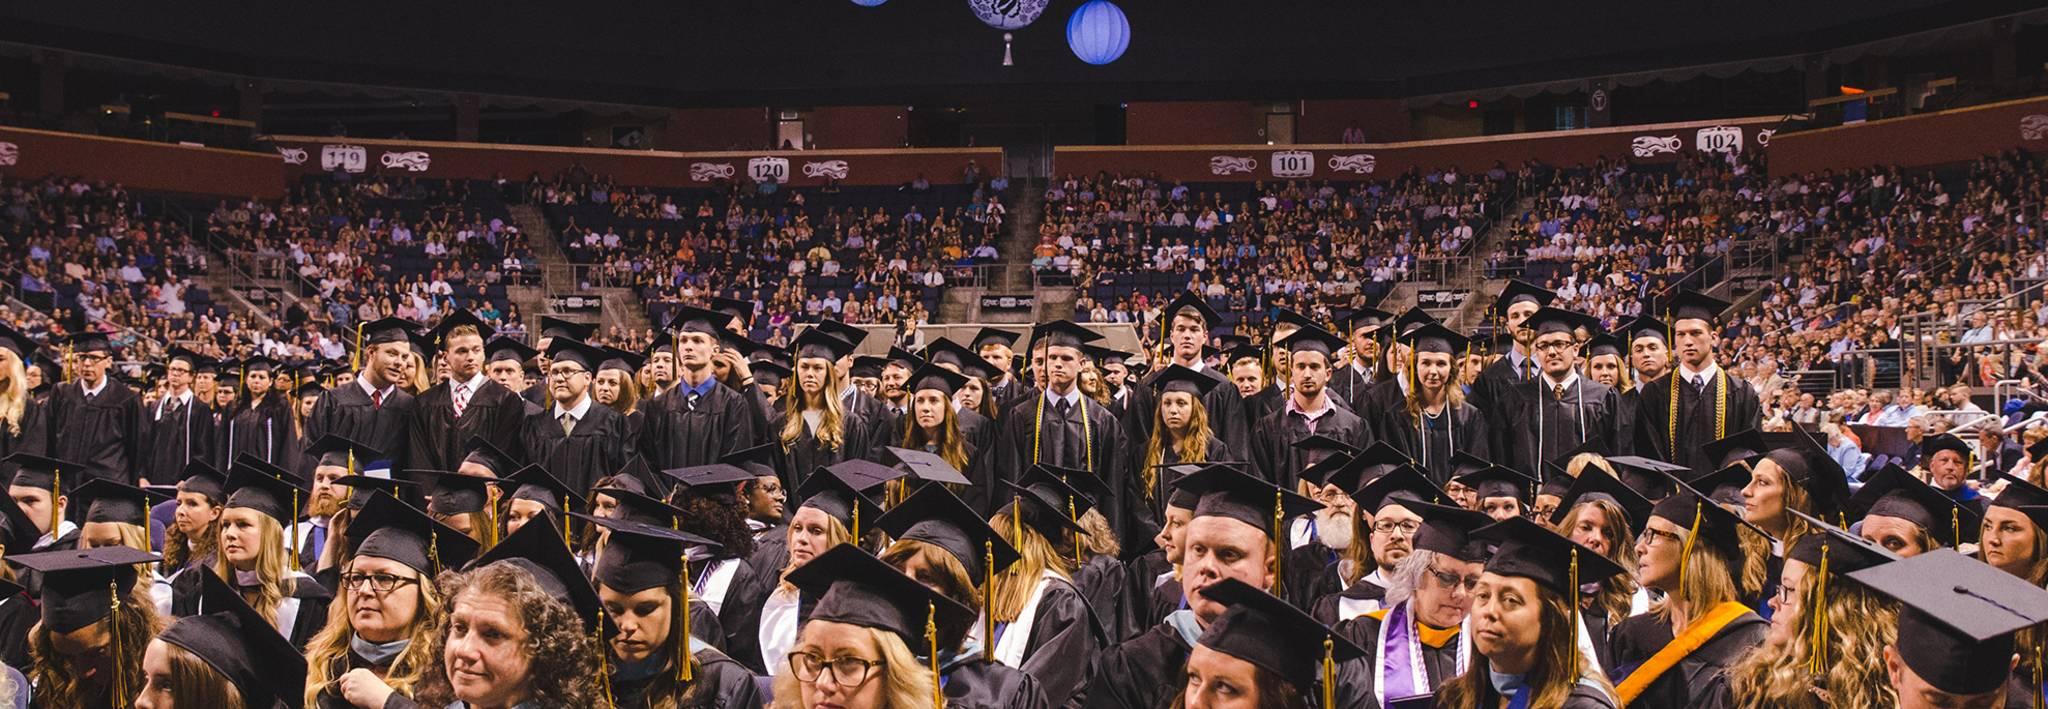 Colorado Christian University commencement ceremony.